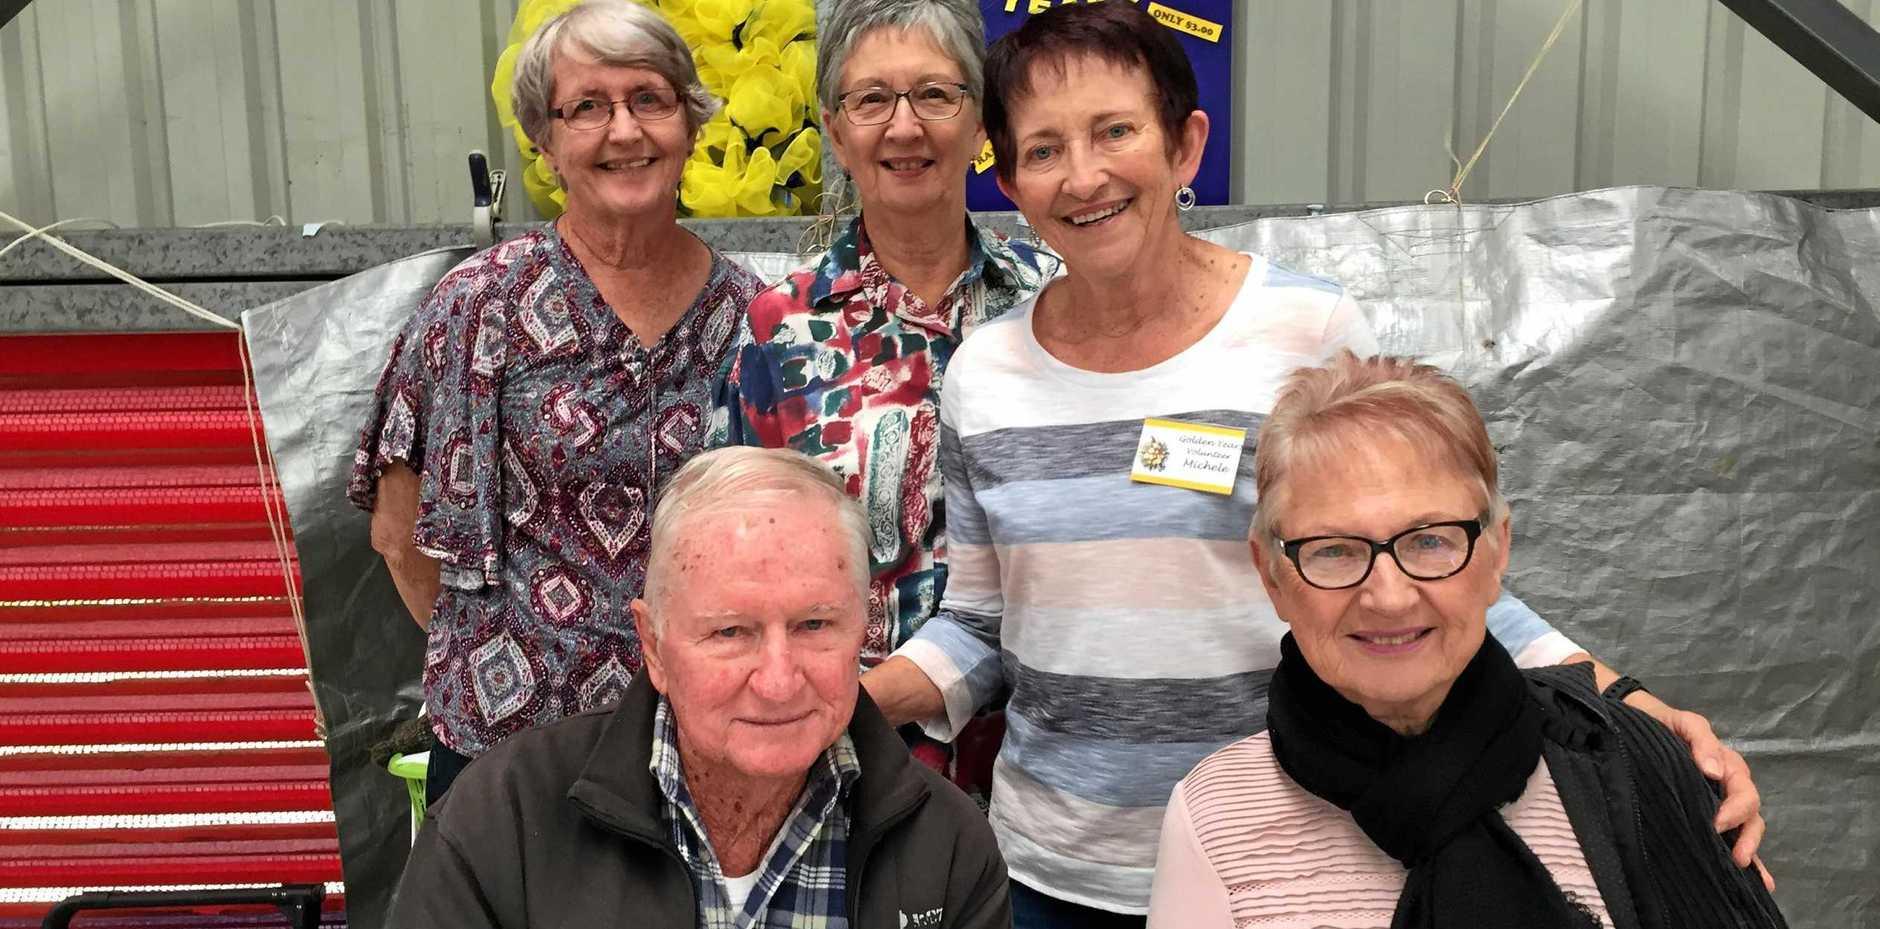 Mackay Golden Years members Liz Wales, Zoe and Michele Shepherd, John Clerc and Rose Sherwell.